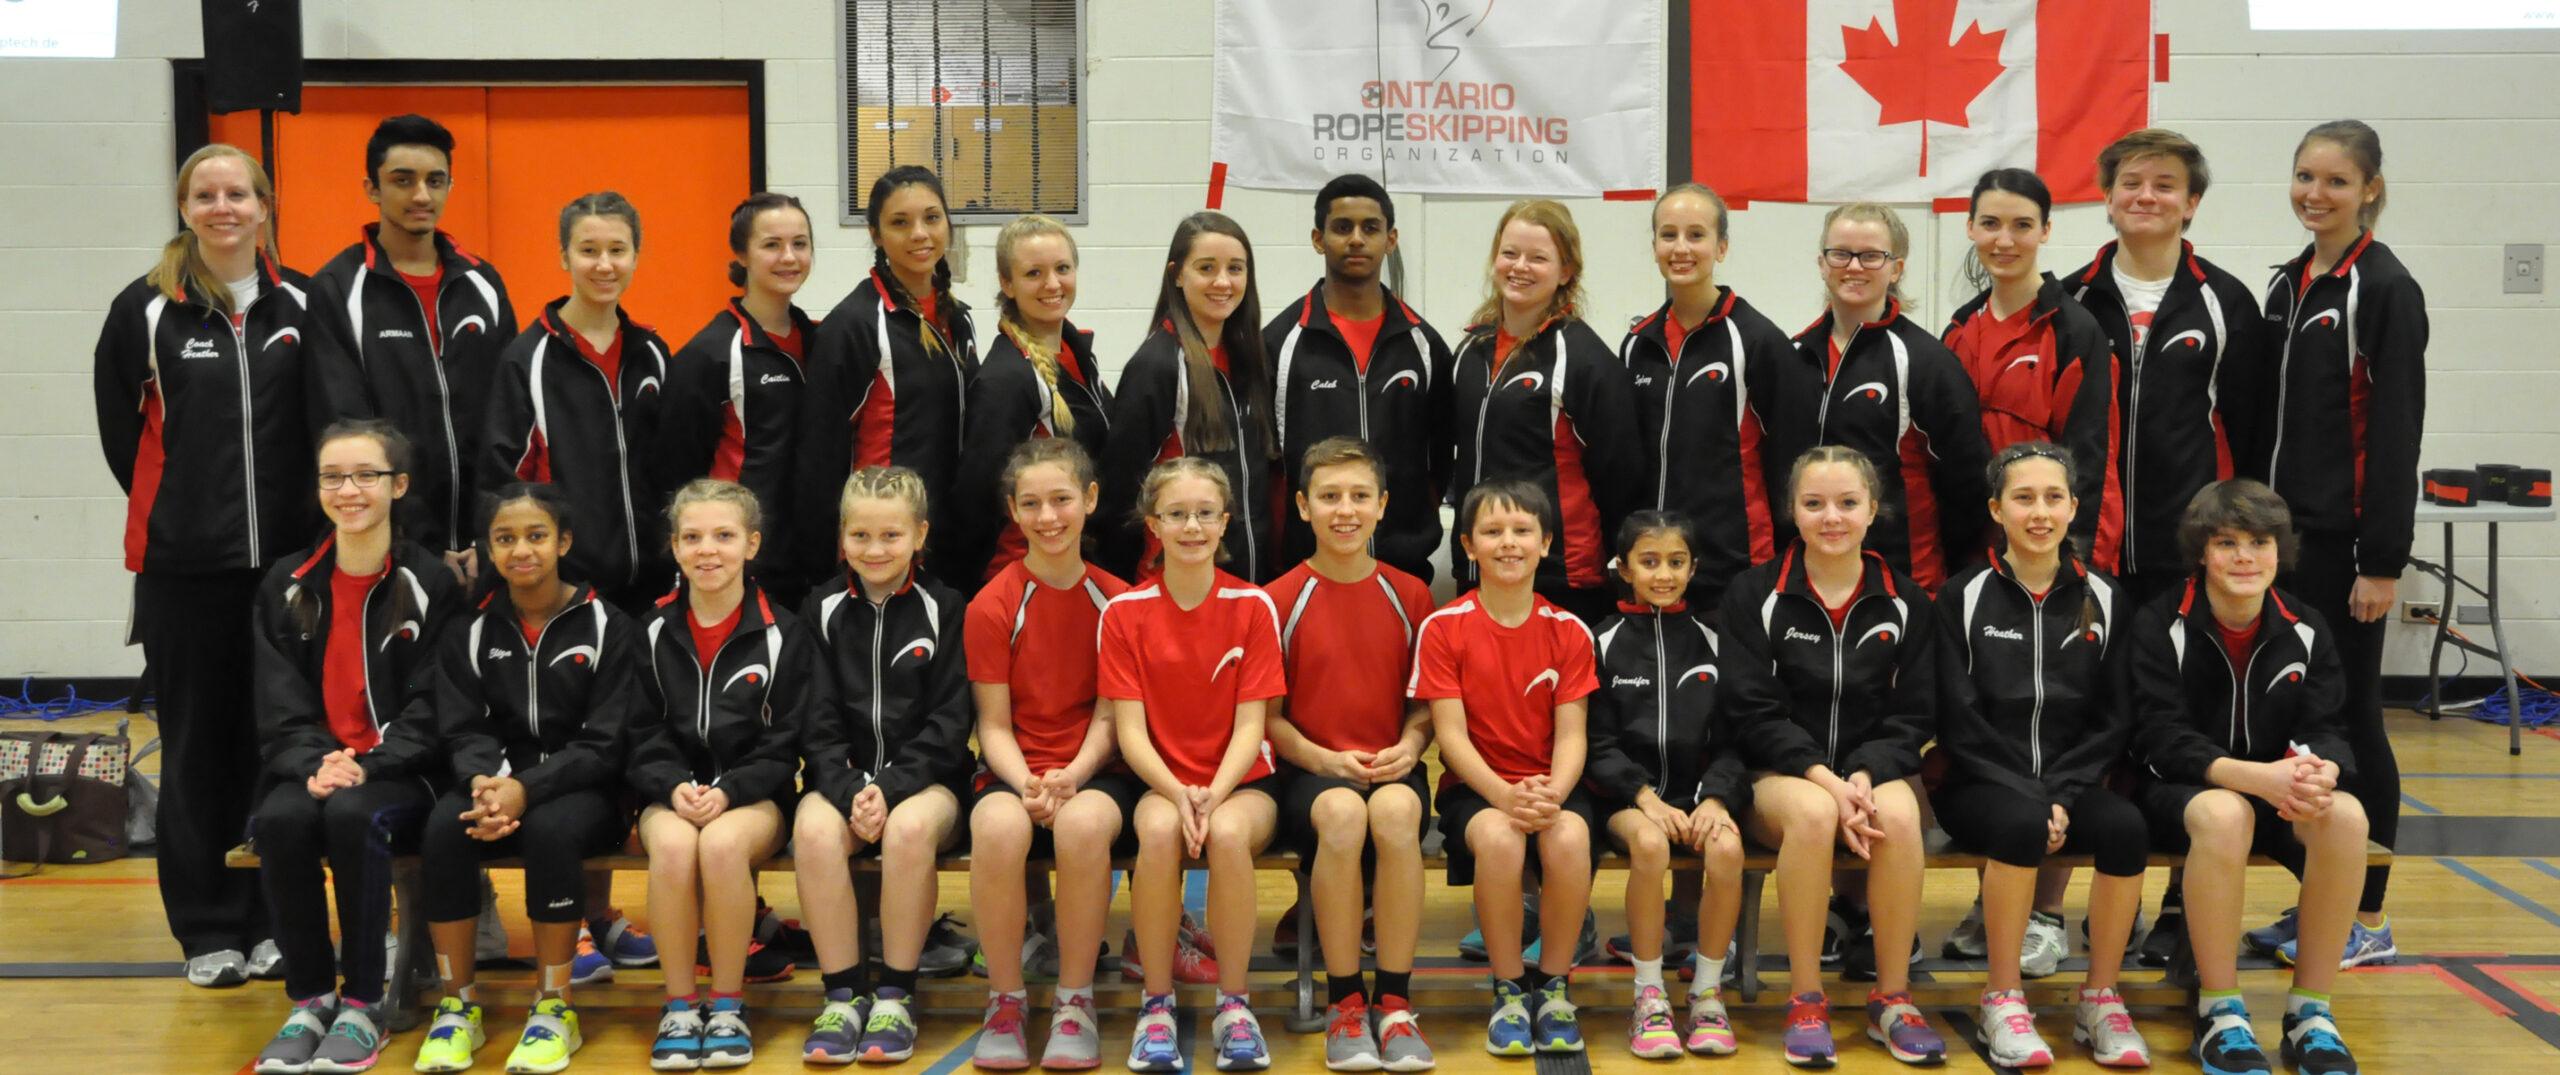 BAR Team 2014-2015